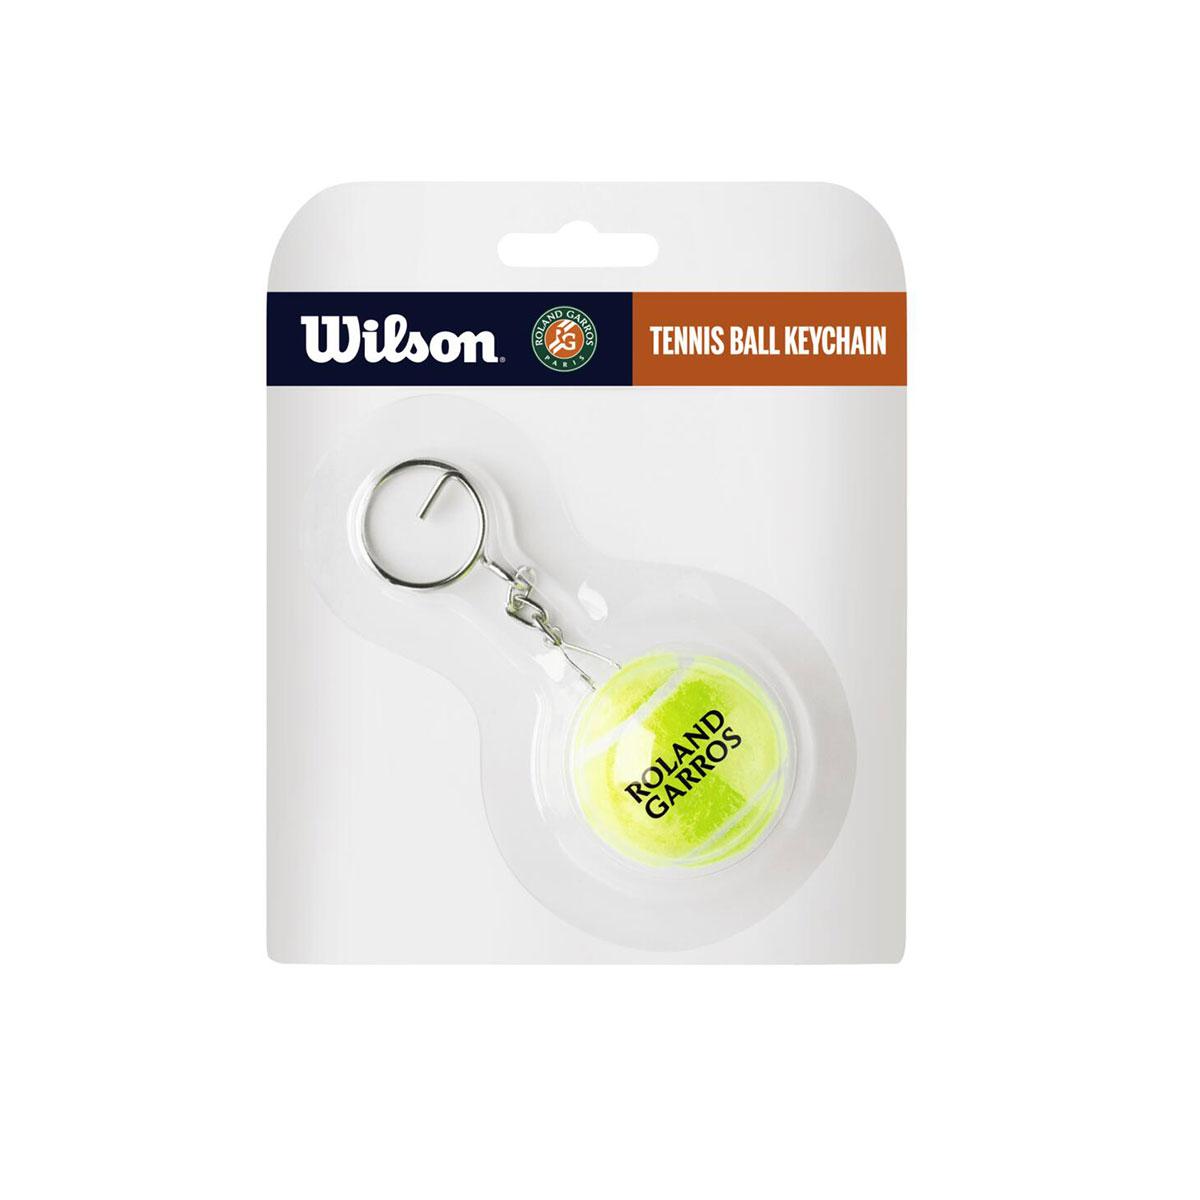 WR8401401_0_Roland_Garros_Tennis_Ball_Keychain_PKG.png.cq5dam.web.1200